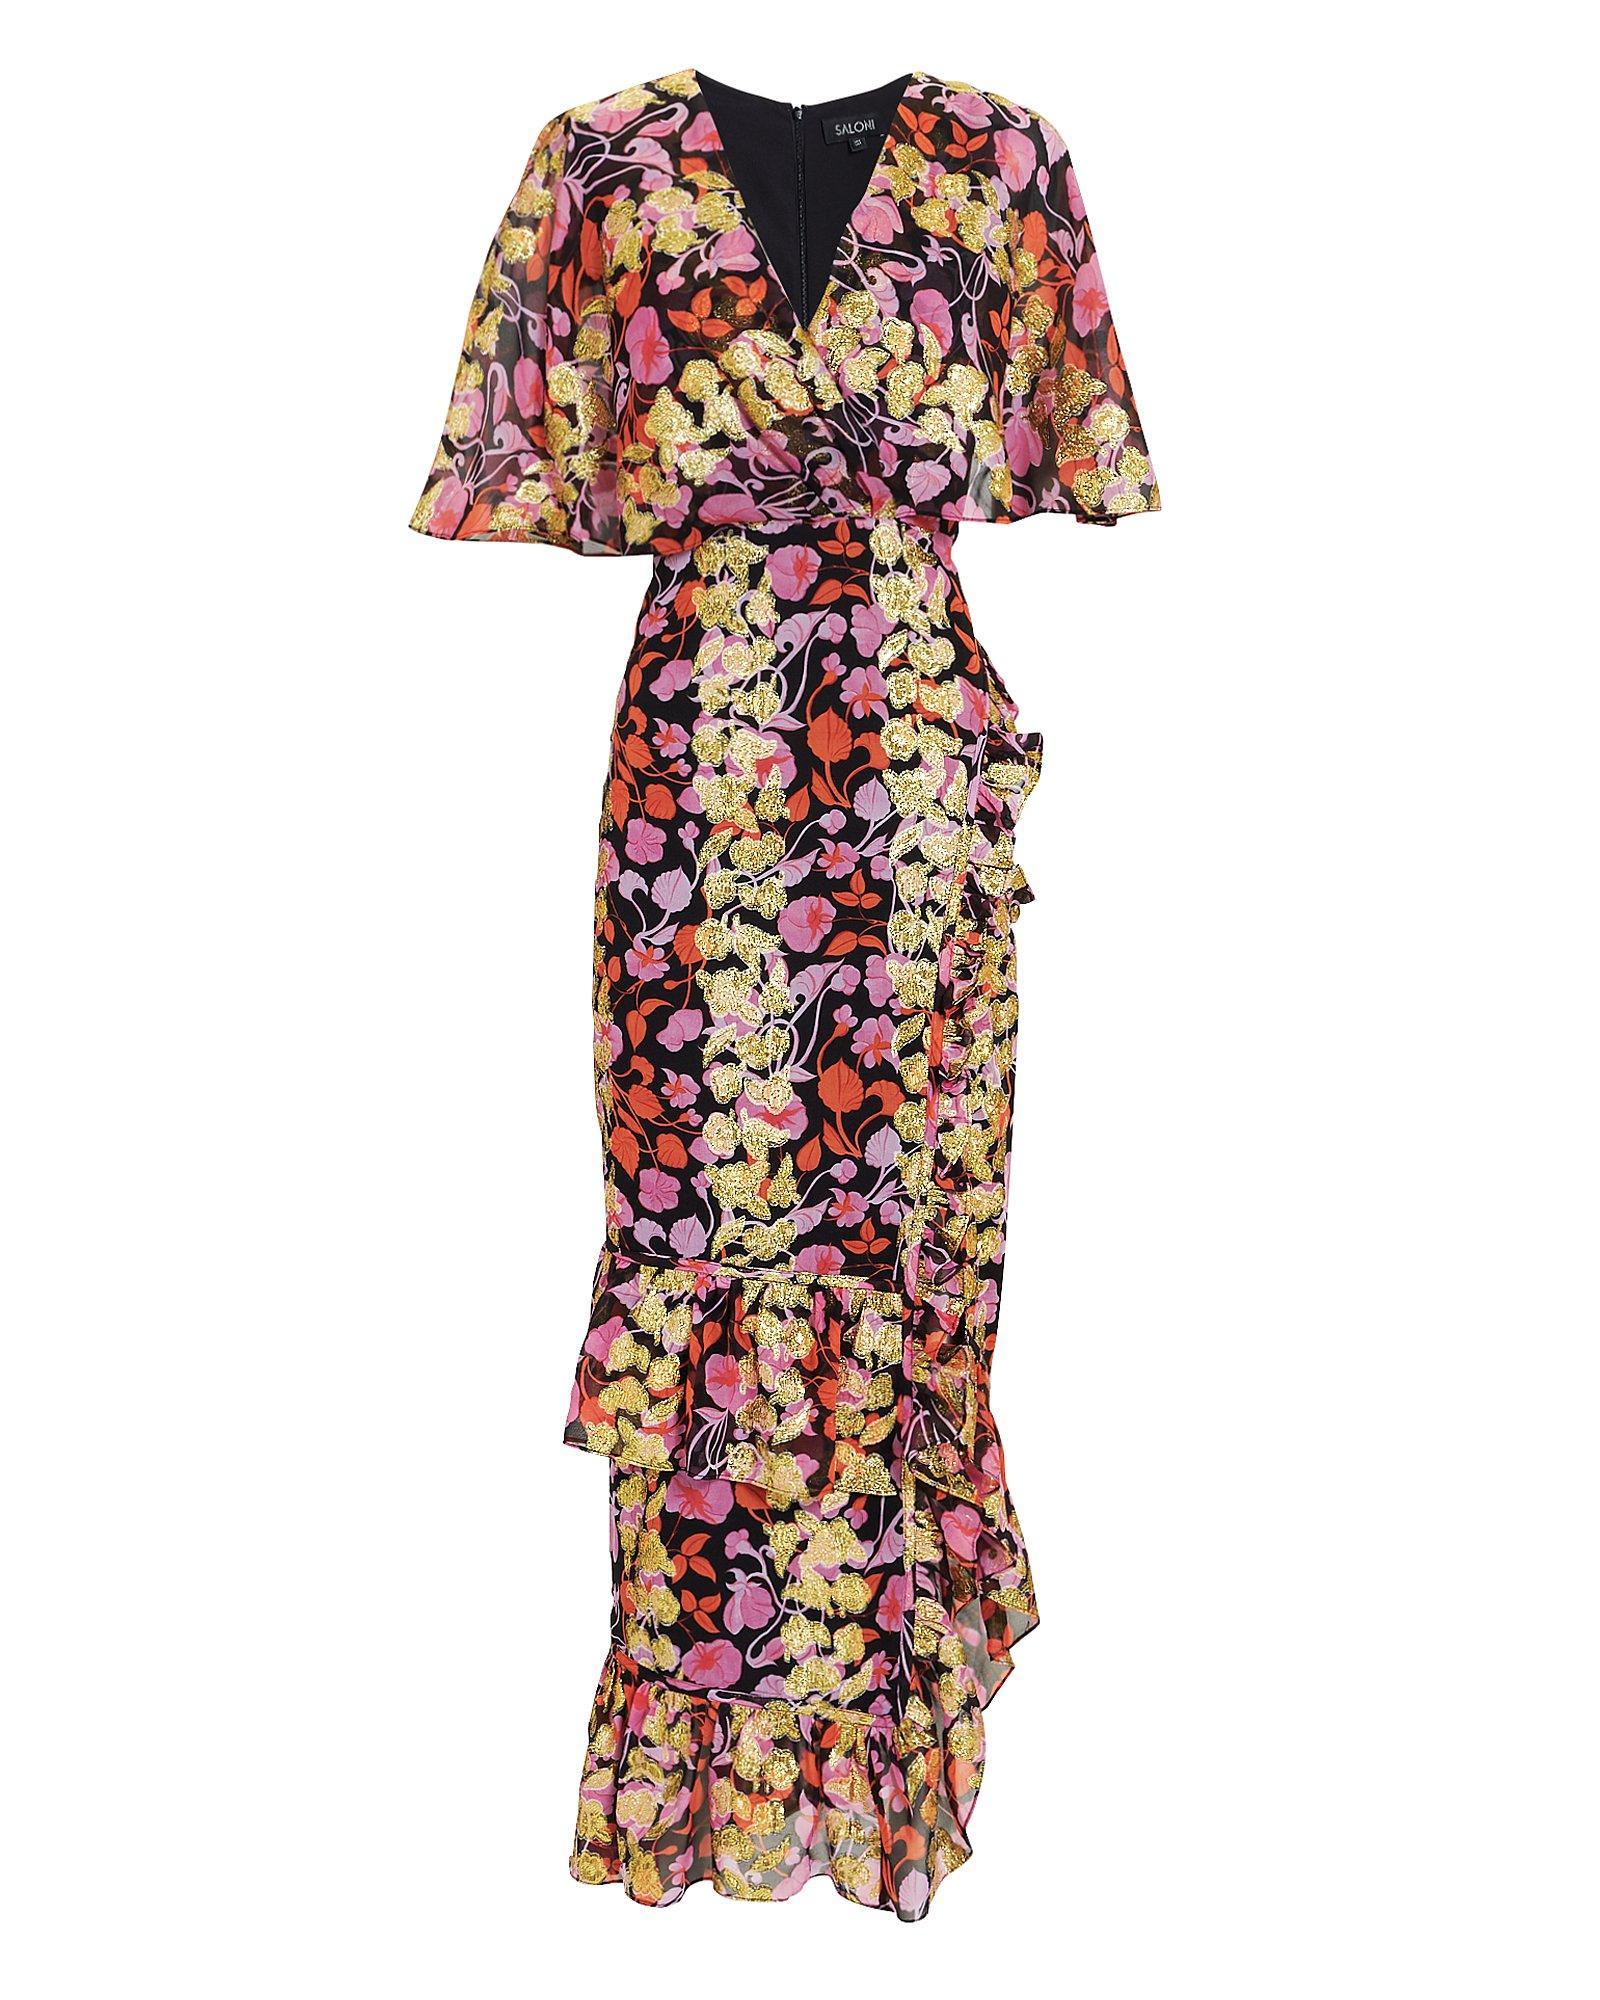 5426ccf769b0 Saloni - Multicolor Cape Overlay Metallic Floral Midi Dress - Lyst. View  fullscreen